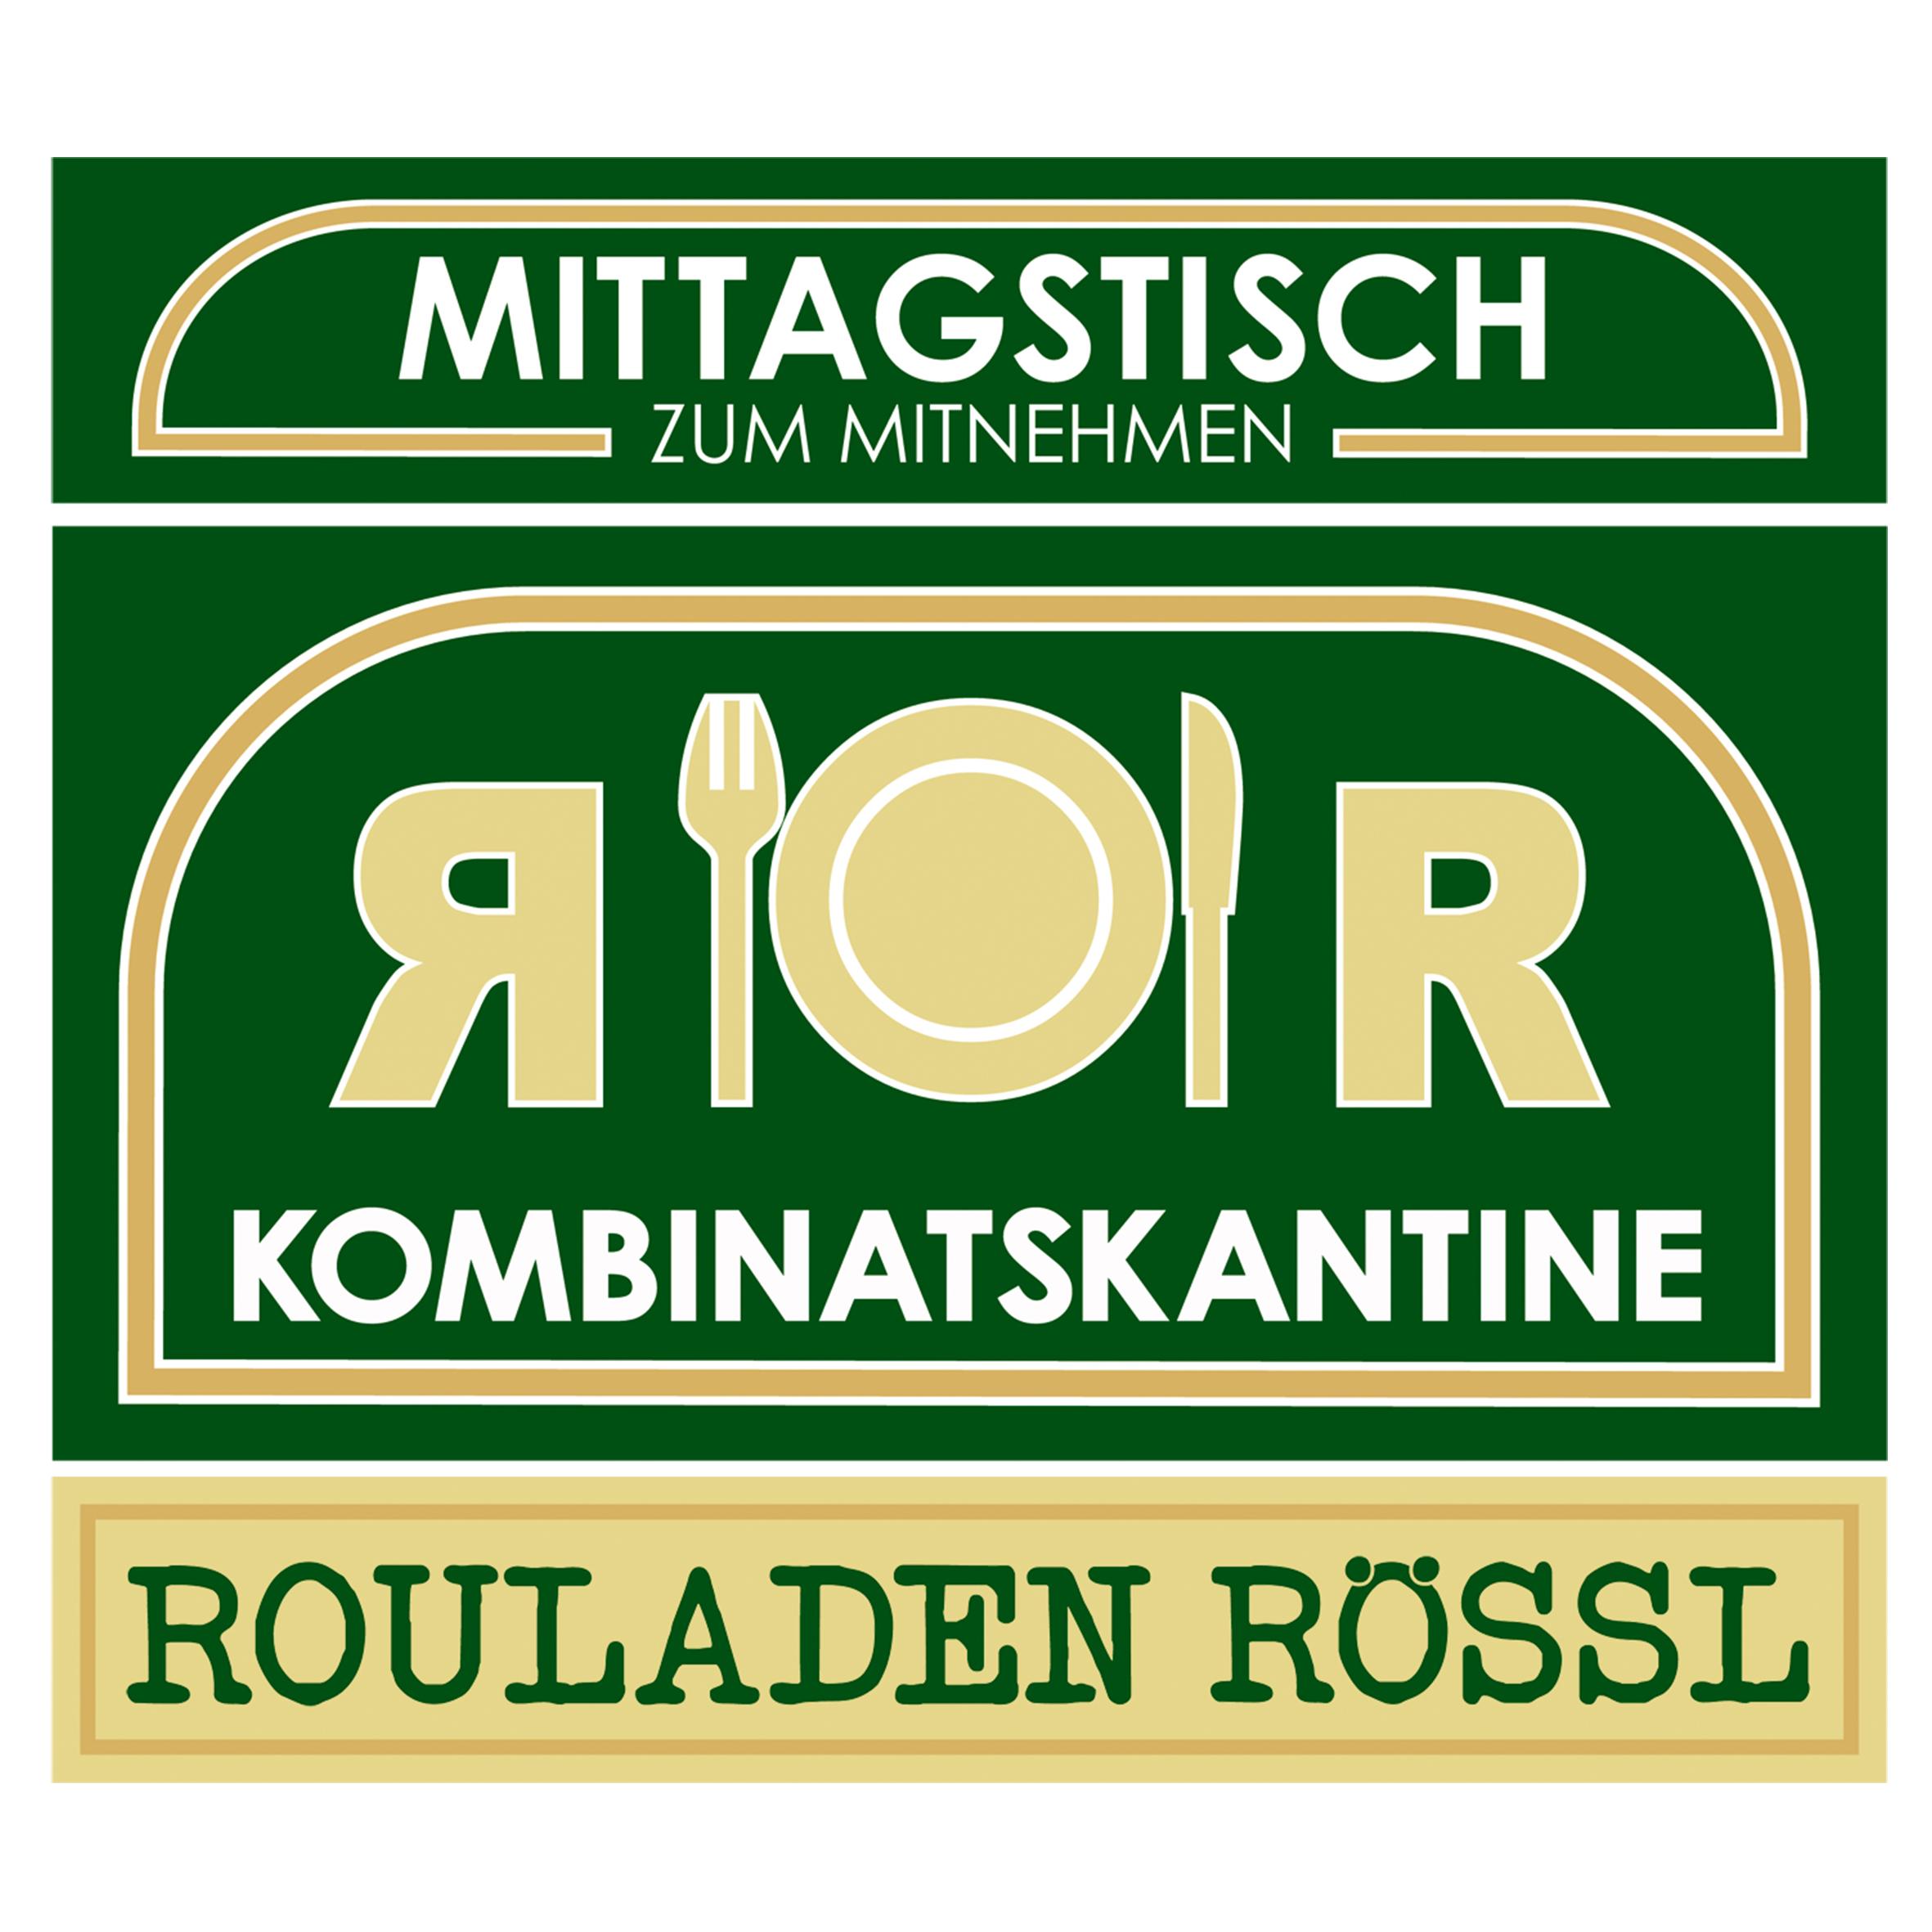 RouladenRössl